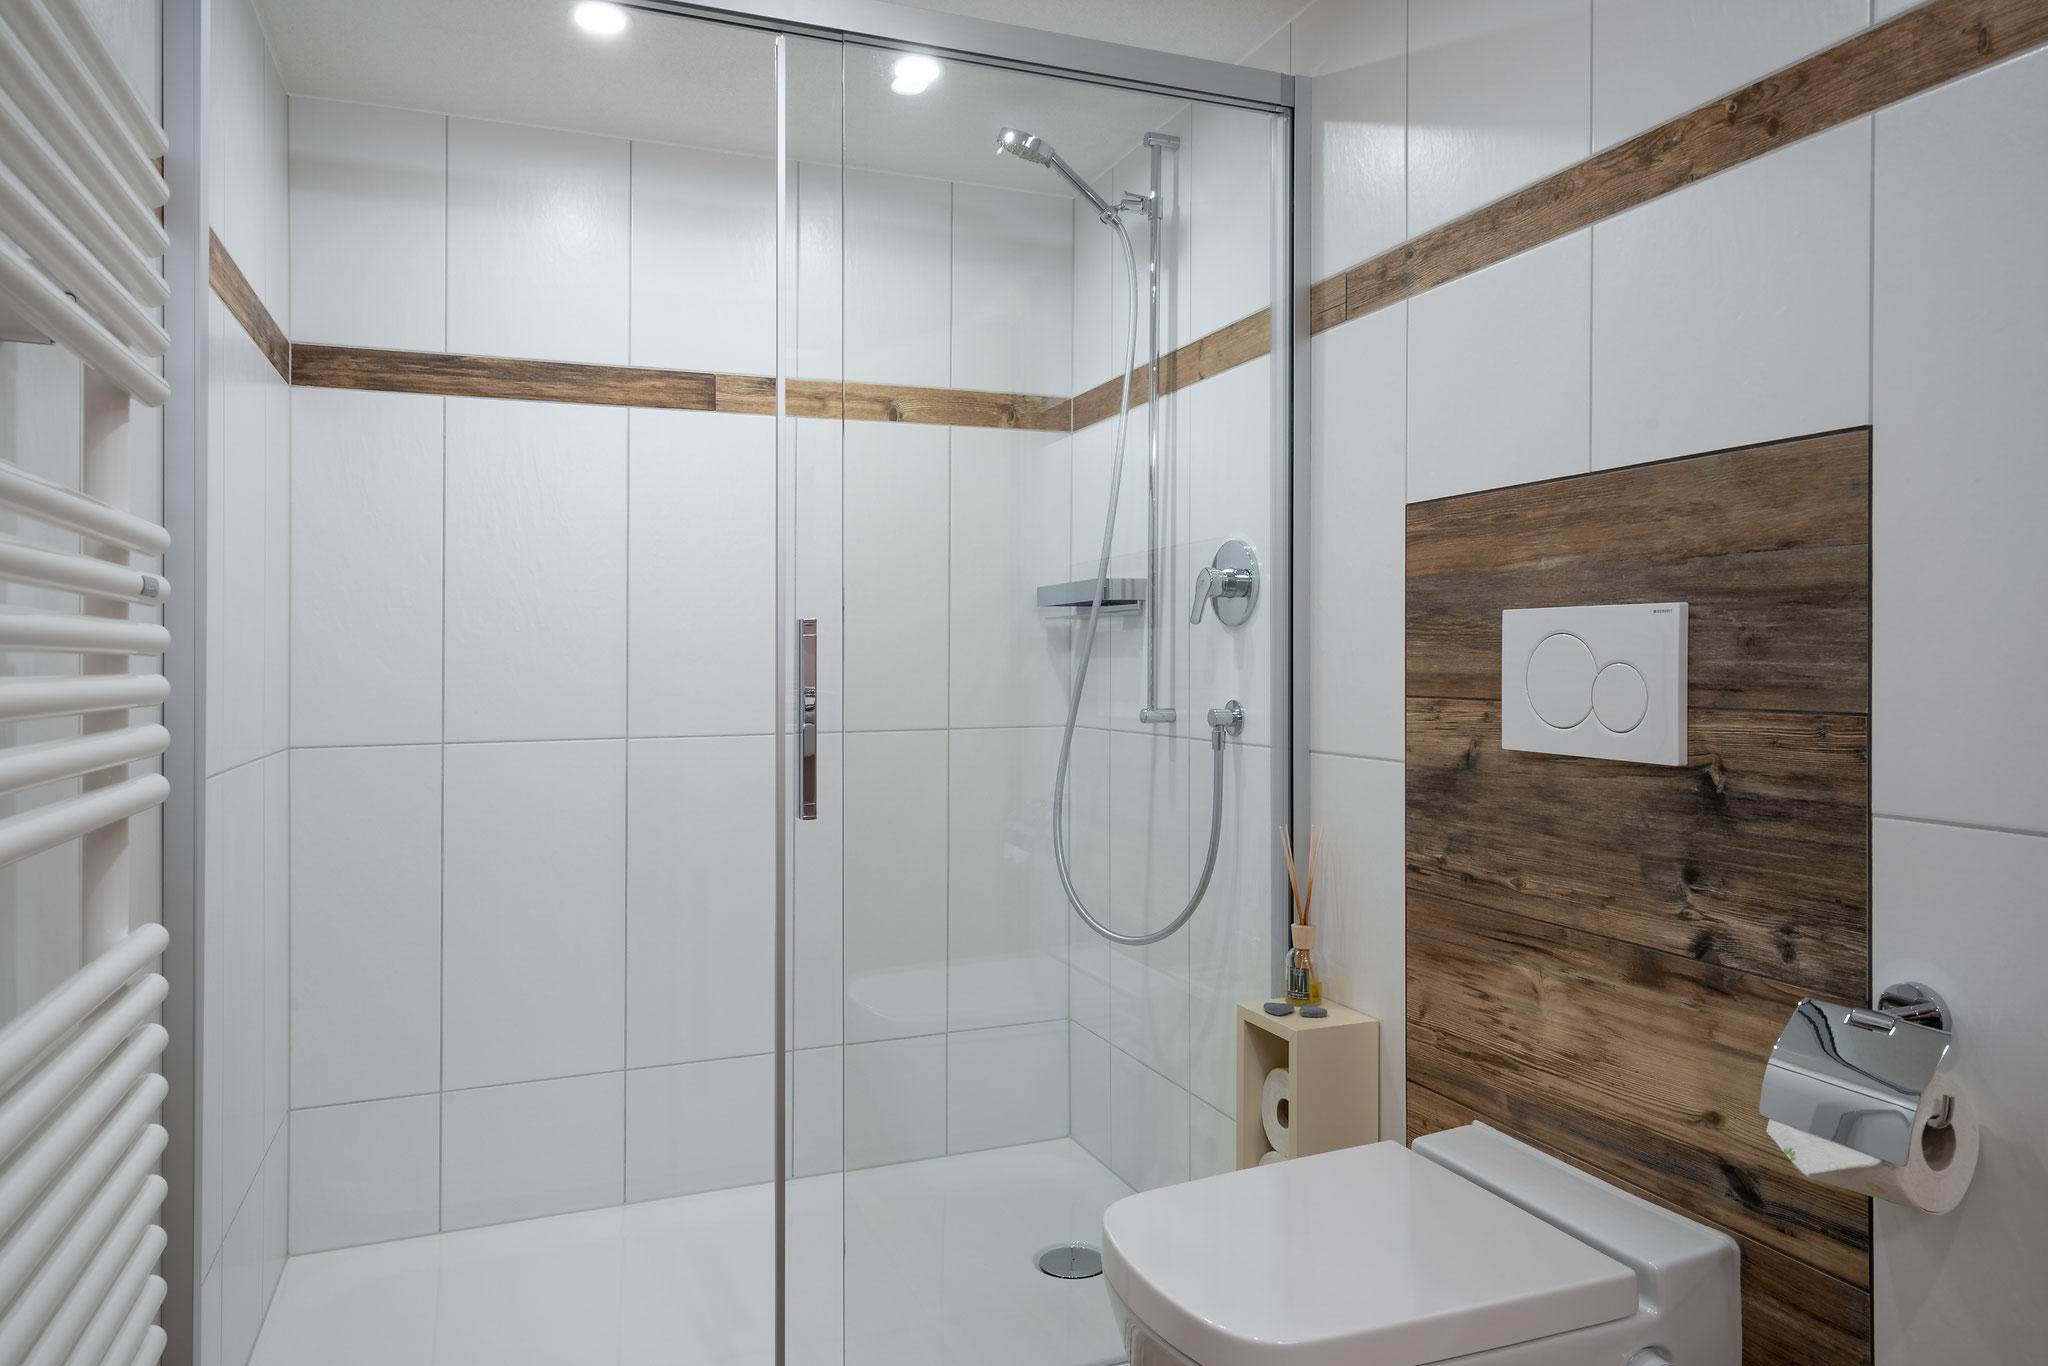 Badezimmer mit Dusche - neu Februar 2019